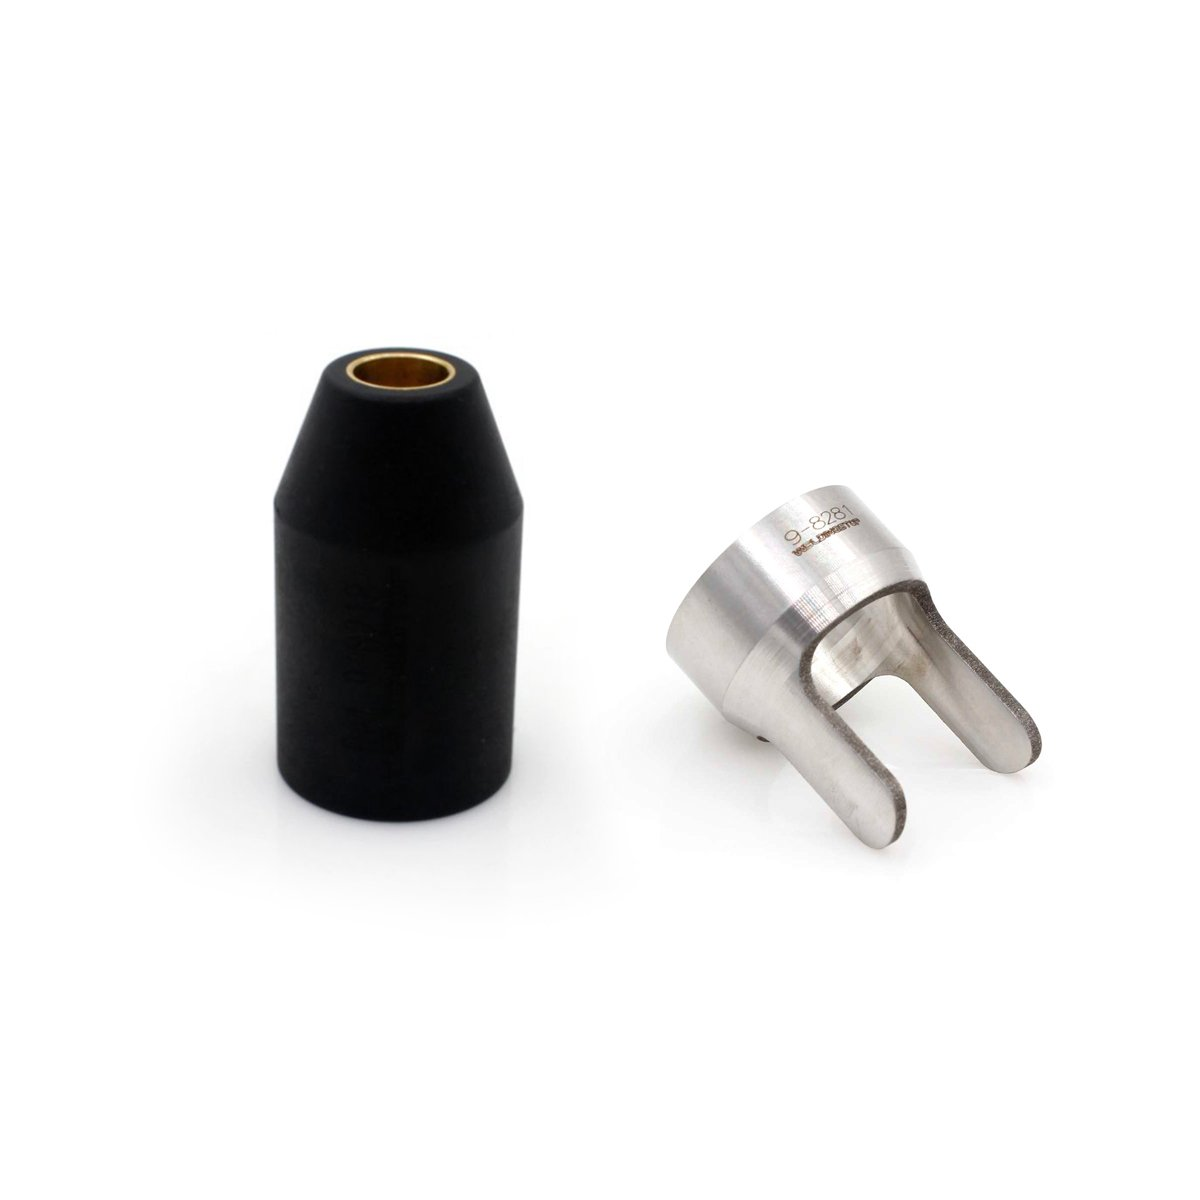 9-8218 & 9-8281 for Thermal Dynamics SL60-SL100 Plasma Torch WeldingStop